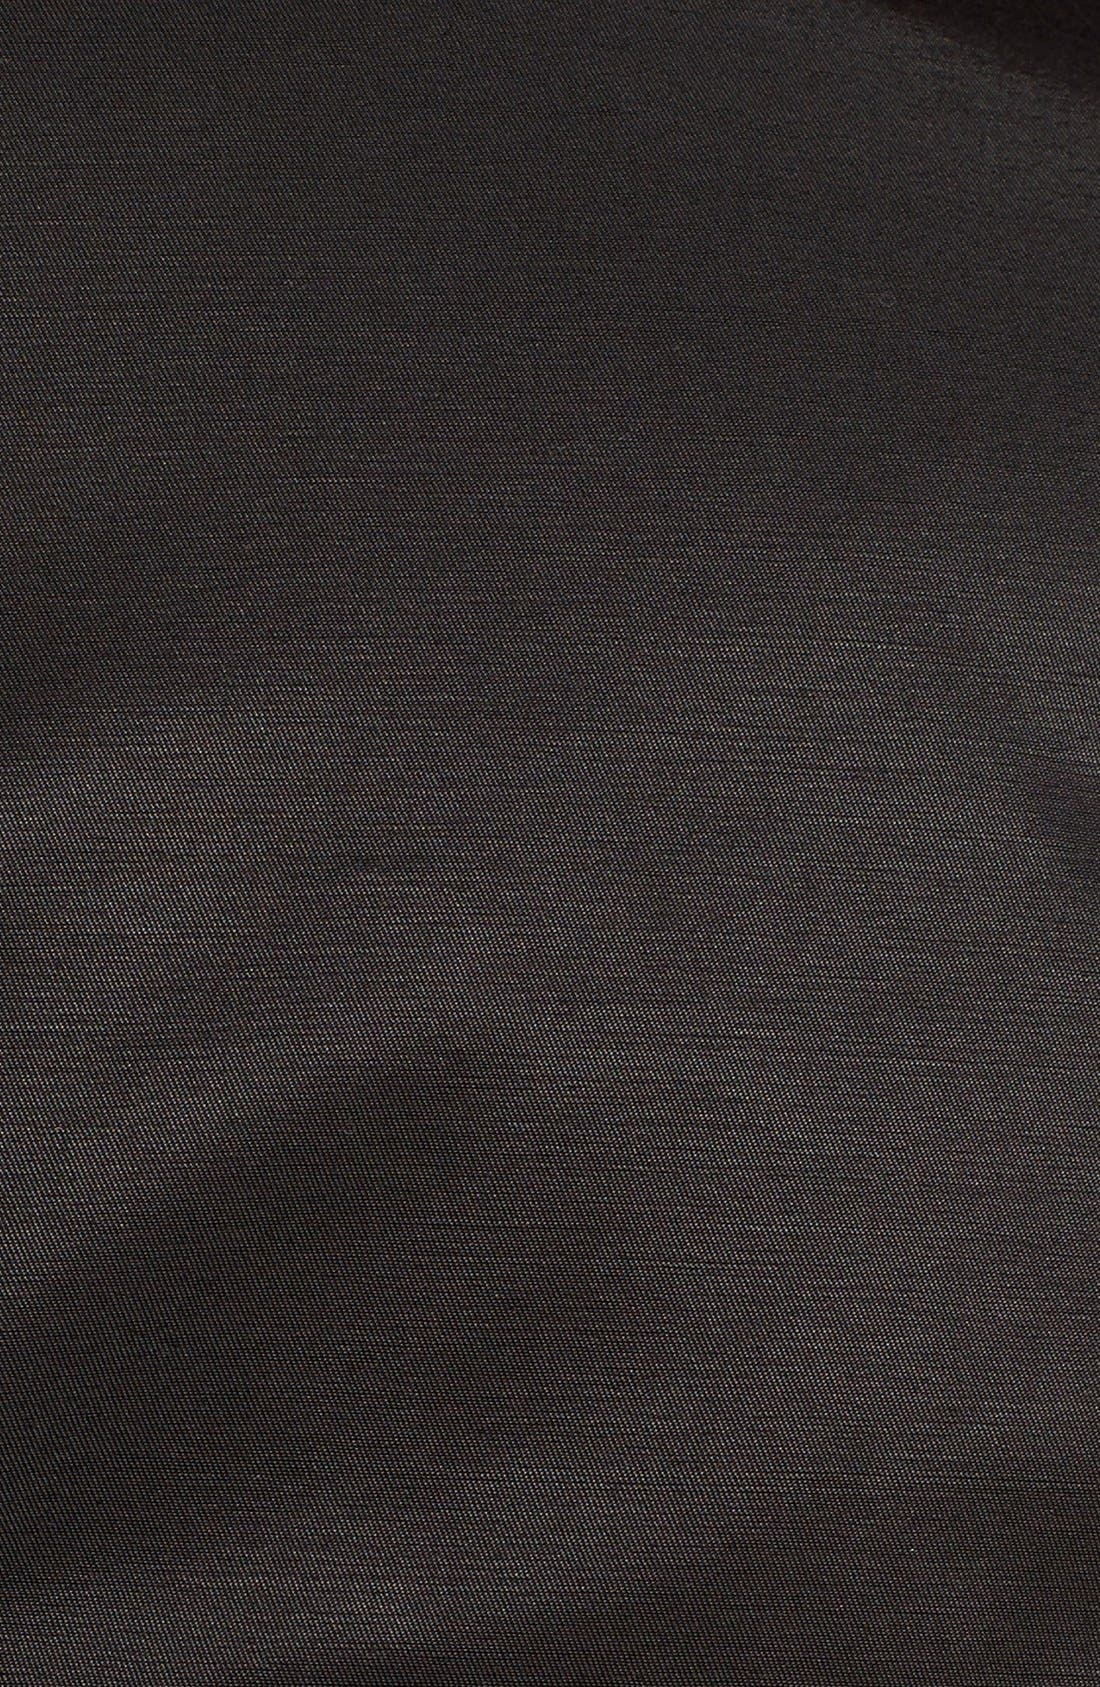 Alternate Image 5  - BCBGeneration Short Double Breasted Skirted Trench Coat